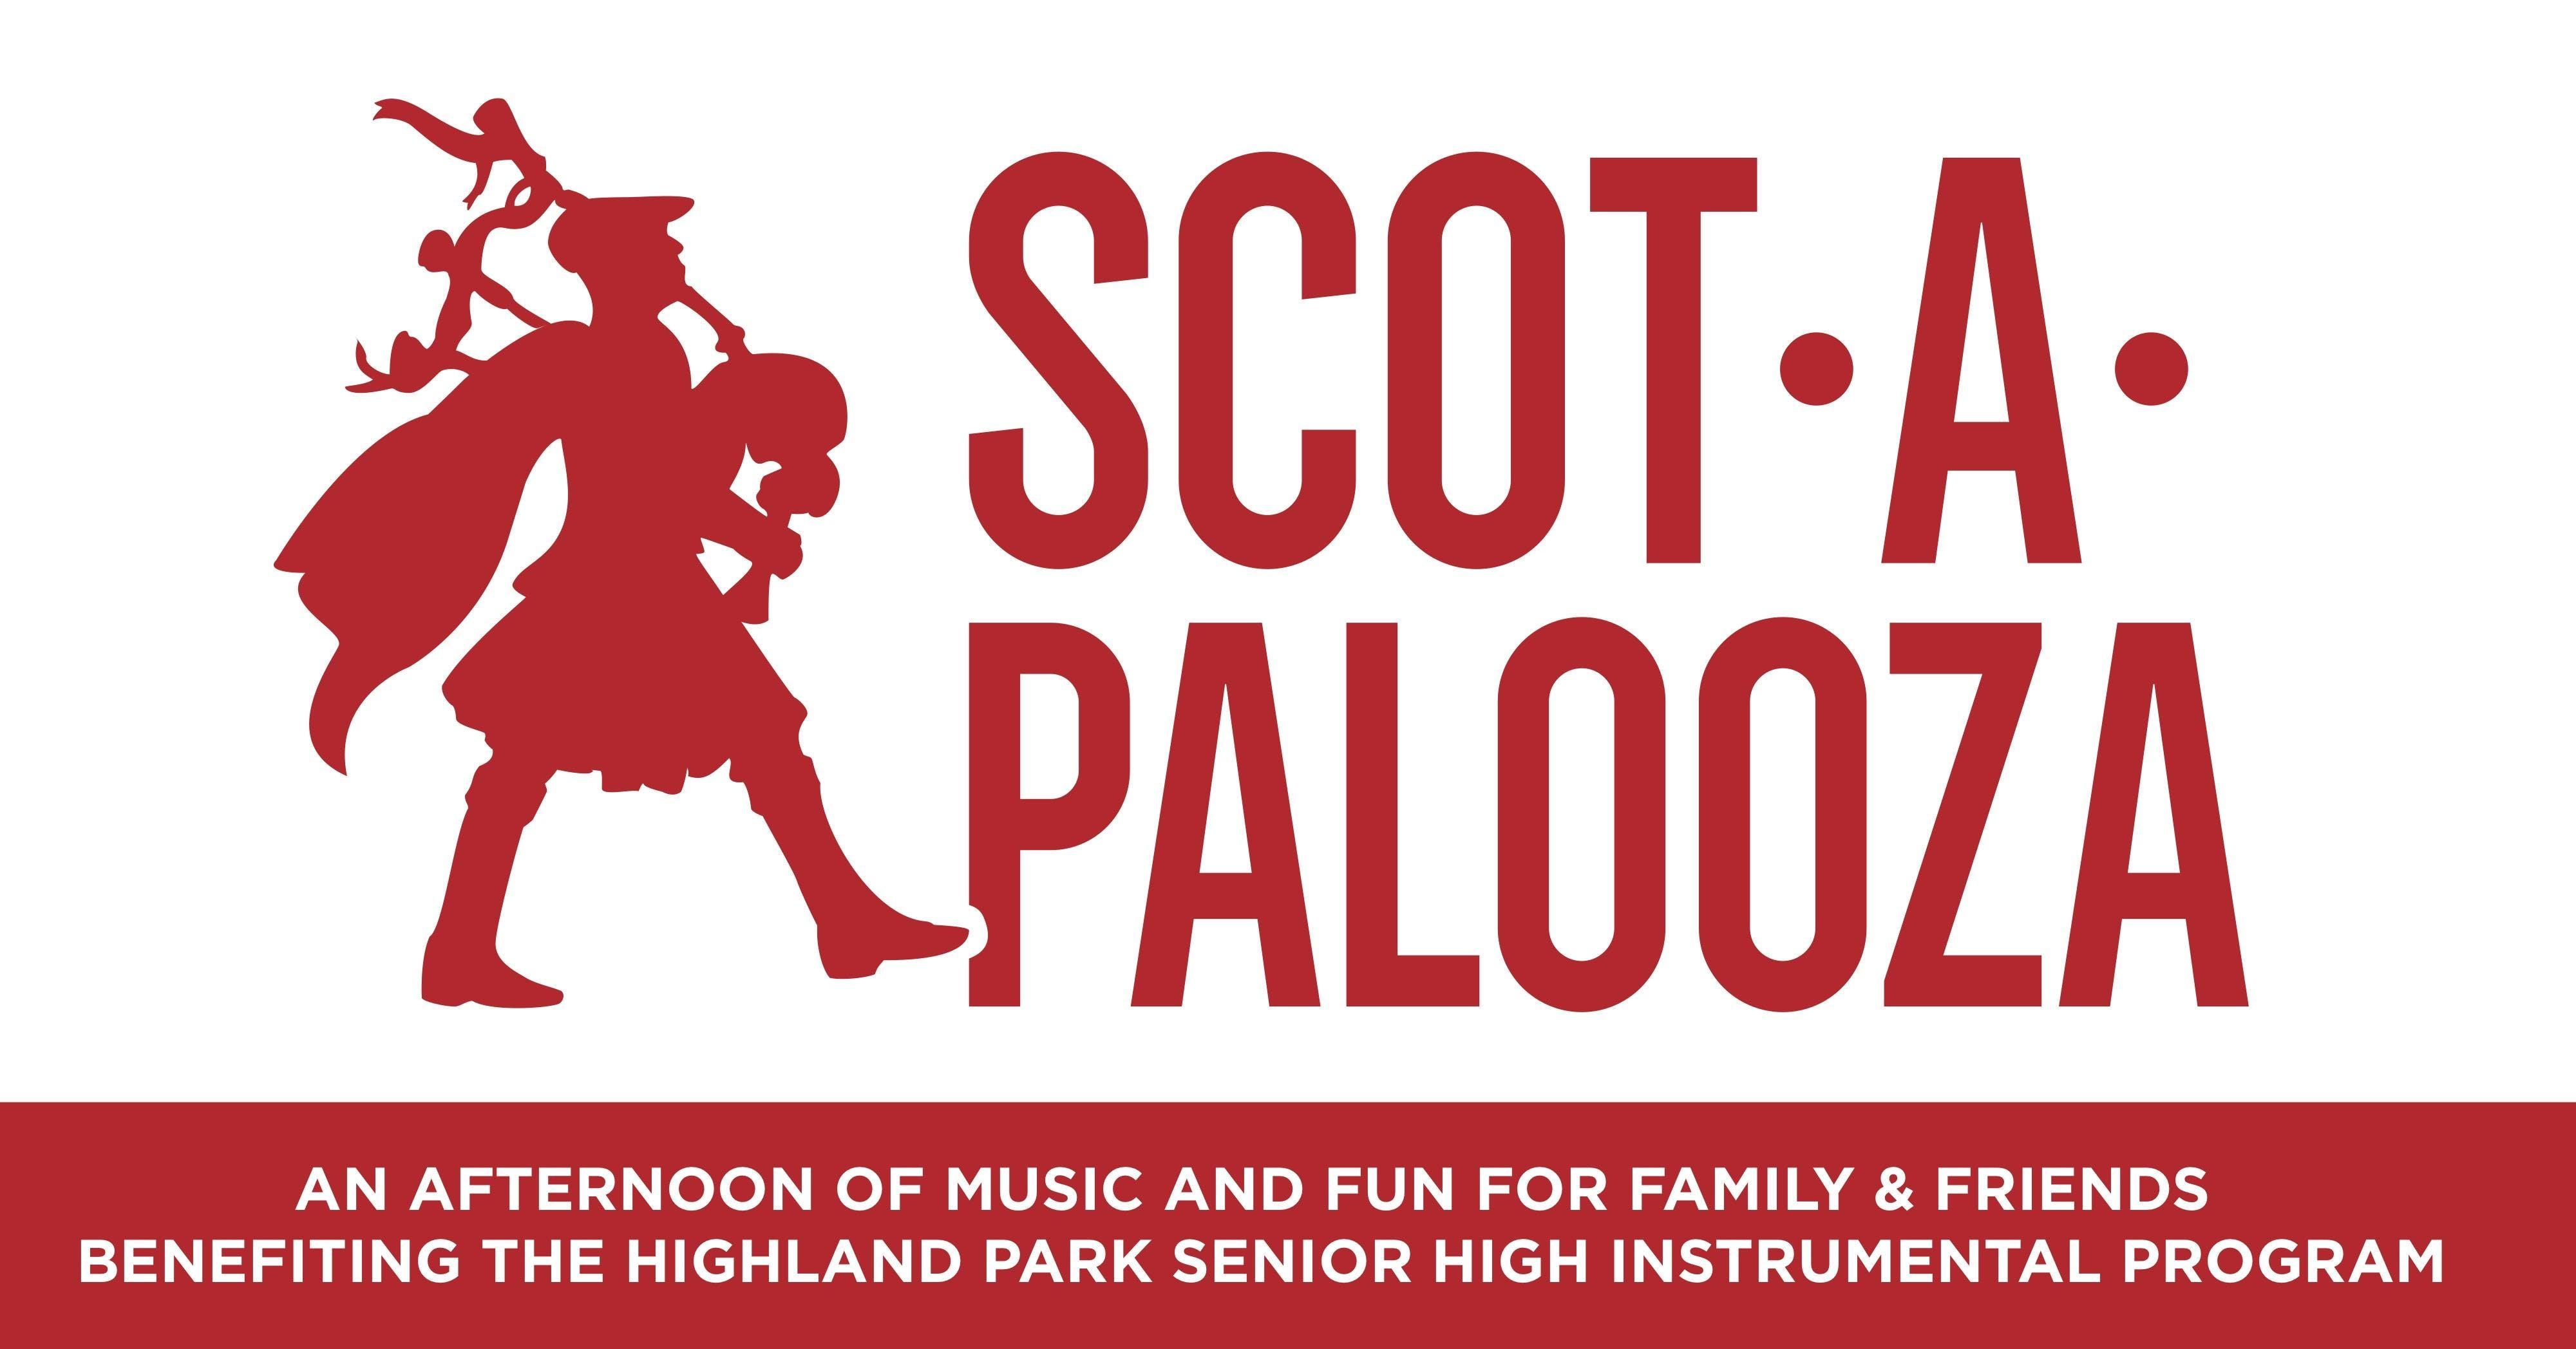 4th Annual Highland Park Senior High Instrumental Music Scot-a-Palooza